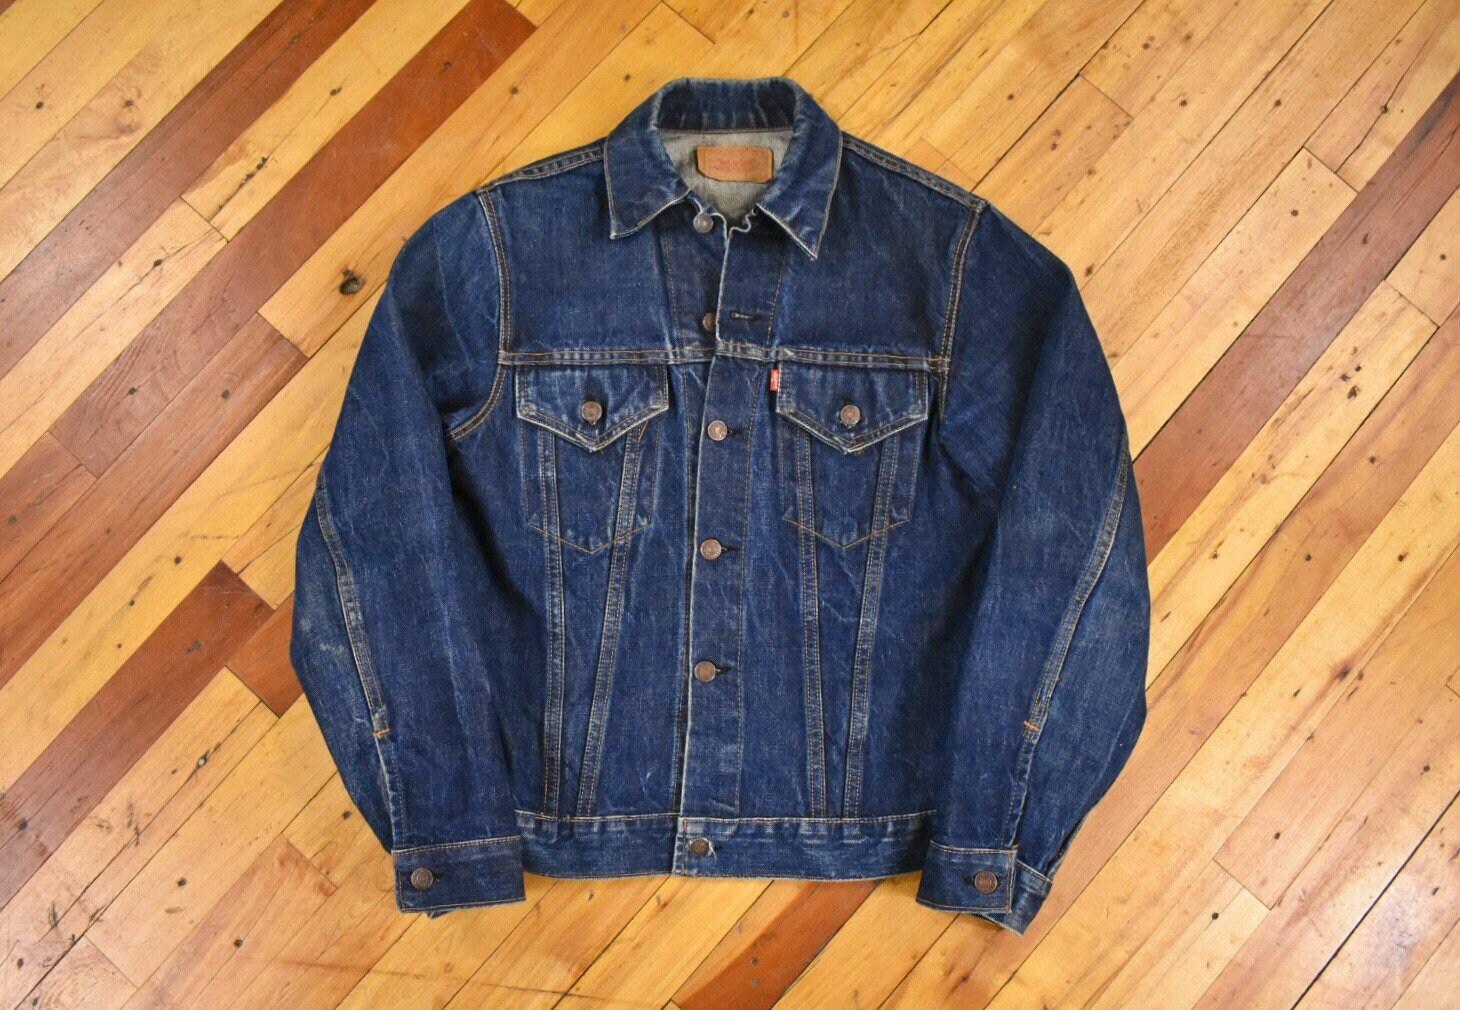 1960s – 70s Men's Ties | Skinny Ties, Slim Ties 60S Levis Jacket Small Big E Trucker Type Iii Denim Mens Vintage Work Wear $20.00 AT vintagedancer.com